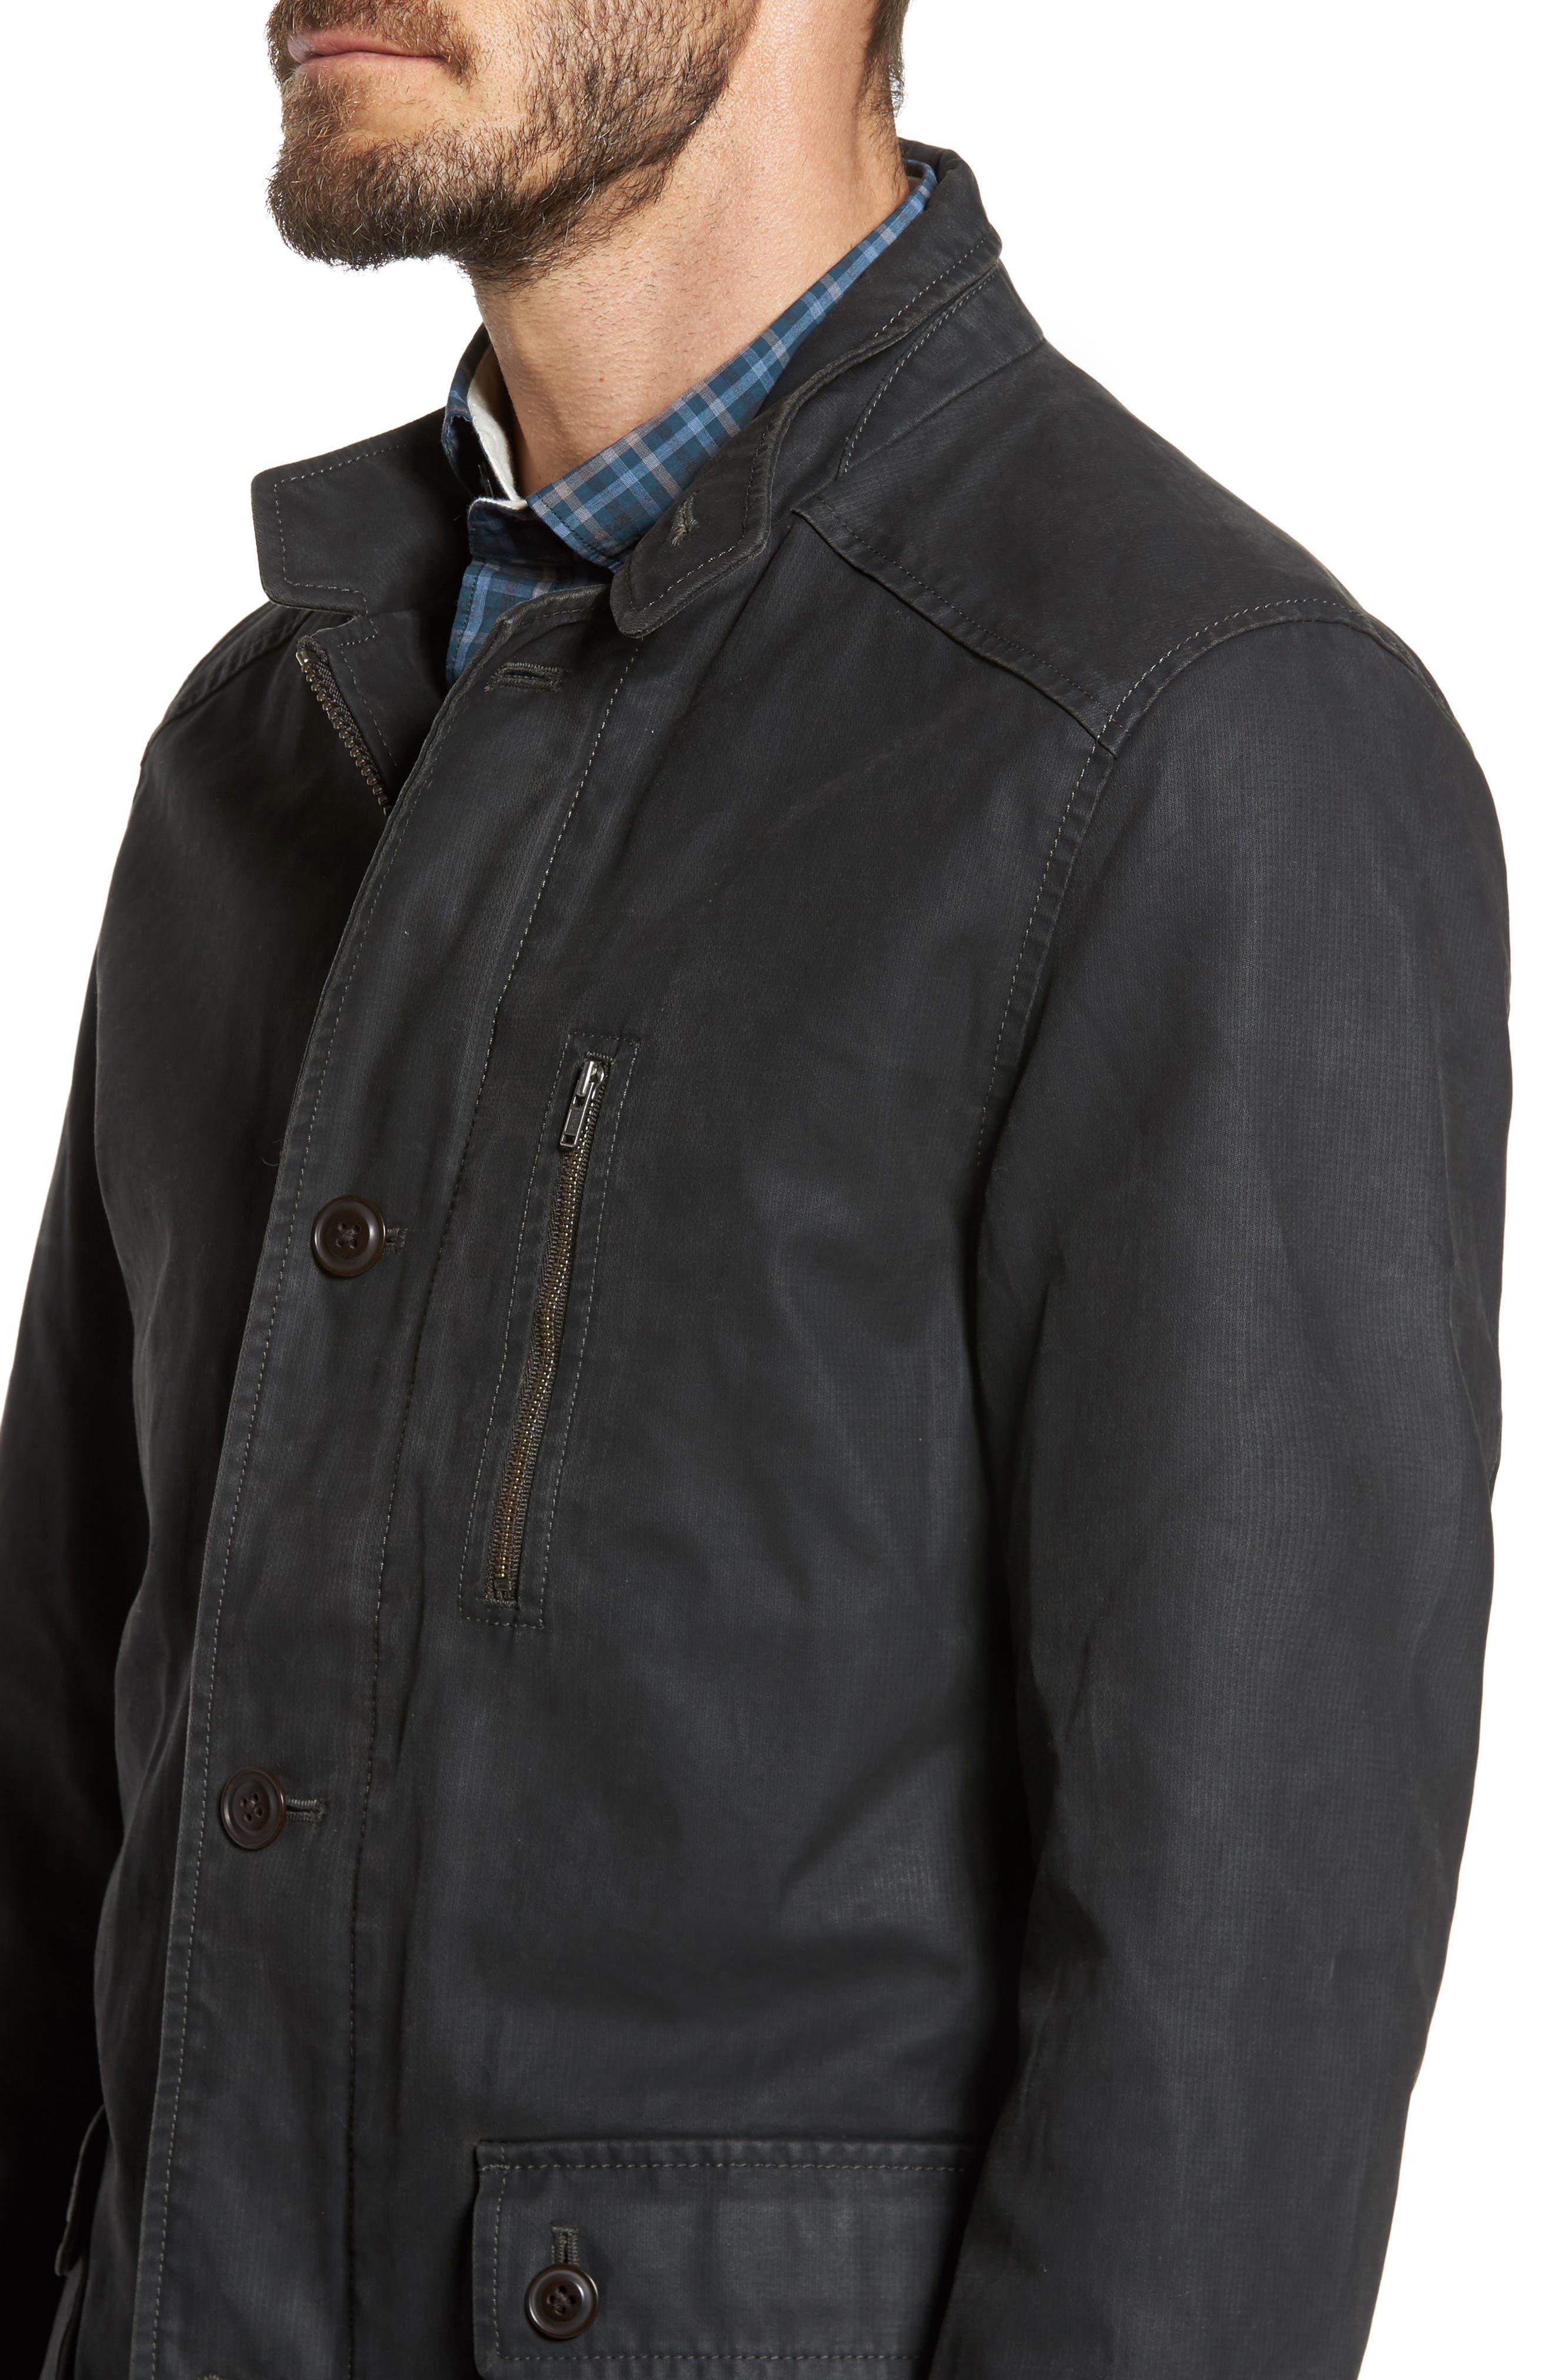 Blackmount Water-Resistant Jacket,                             Alternate thumbnail 4, color,                             302